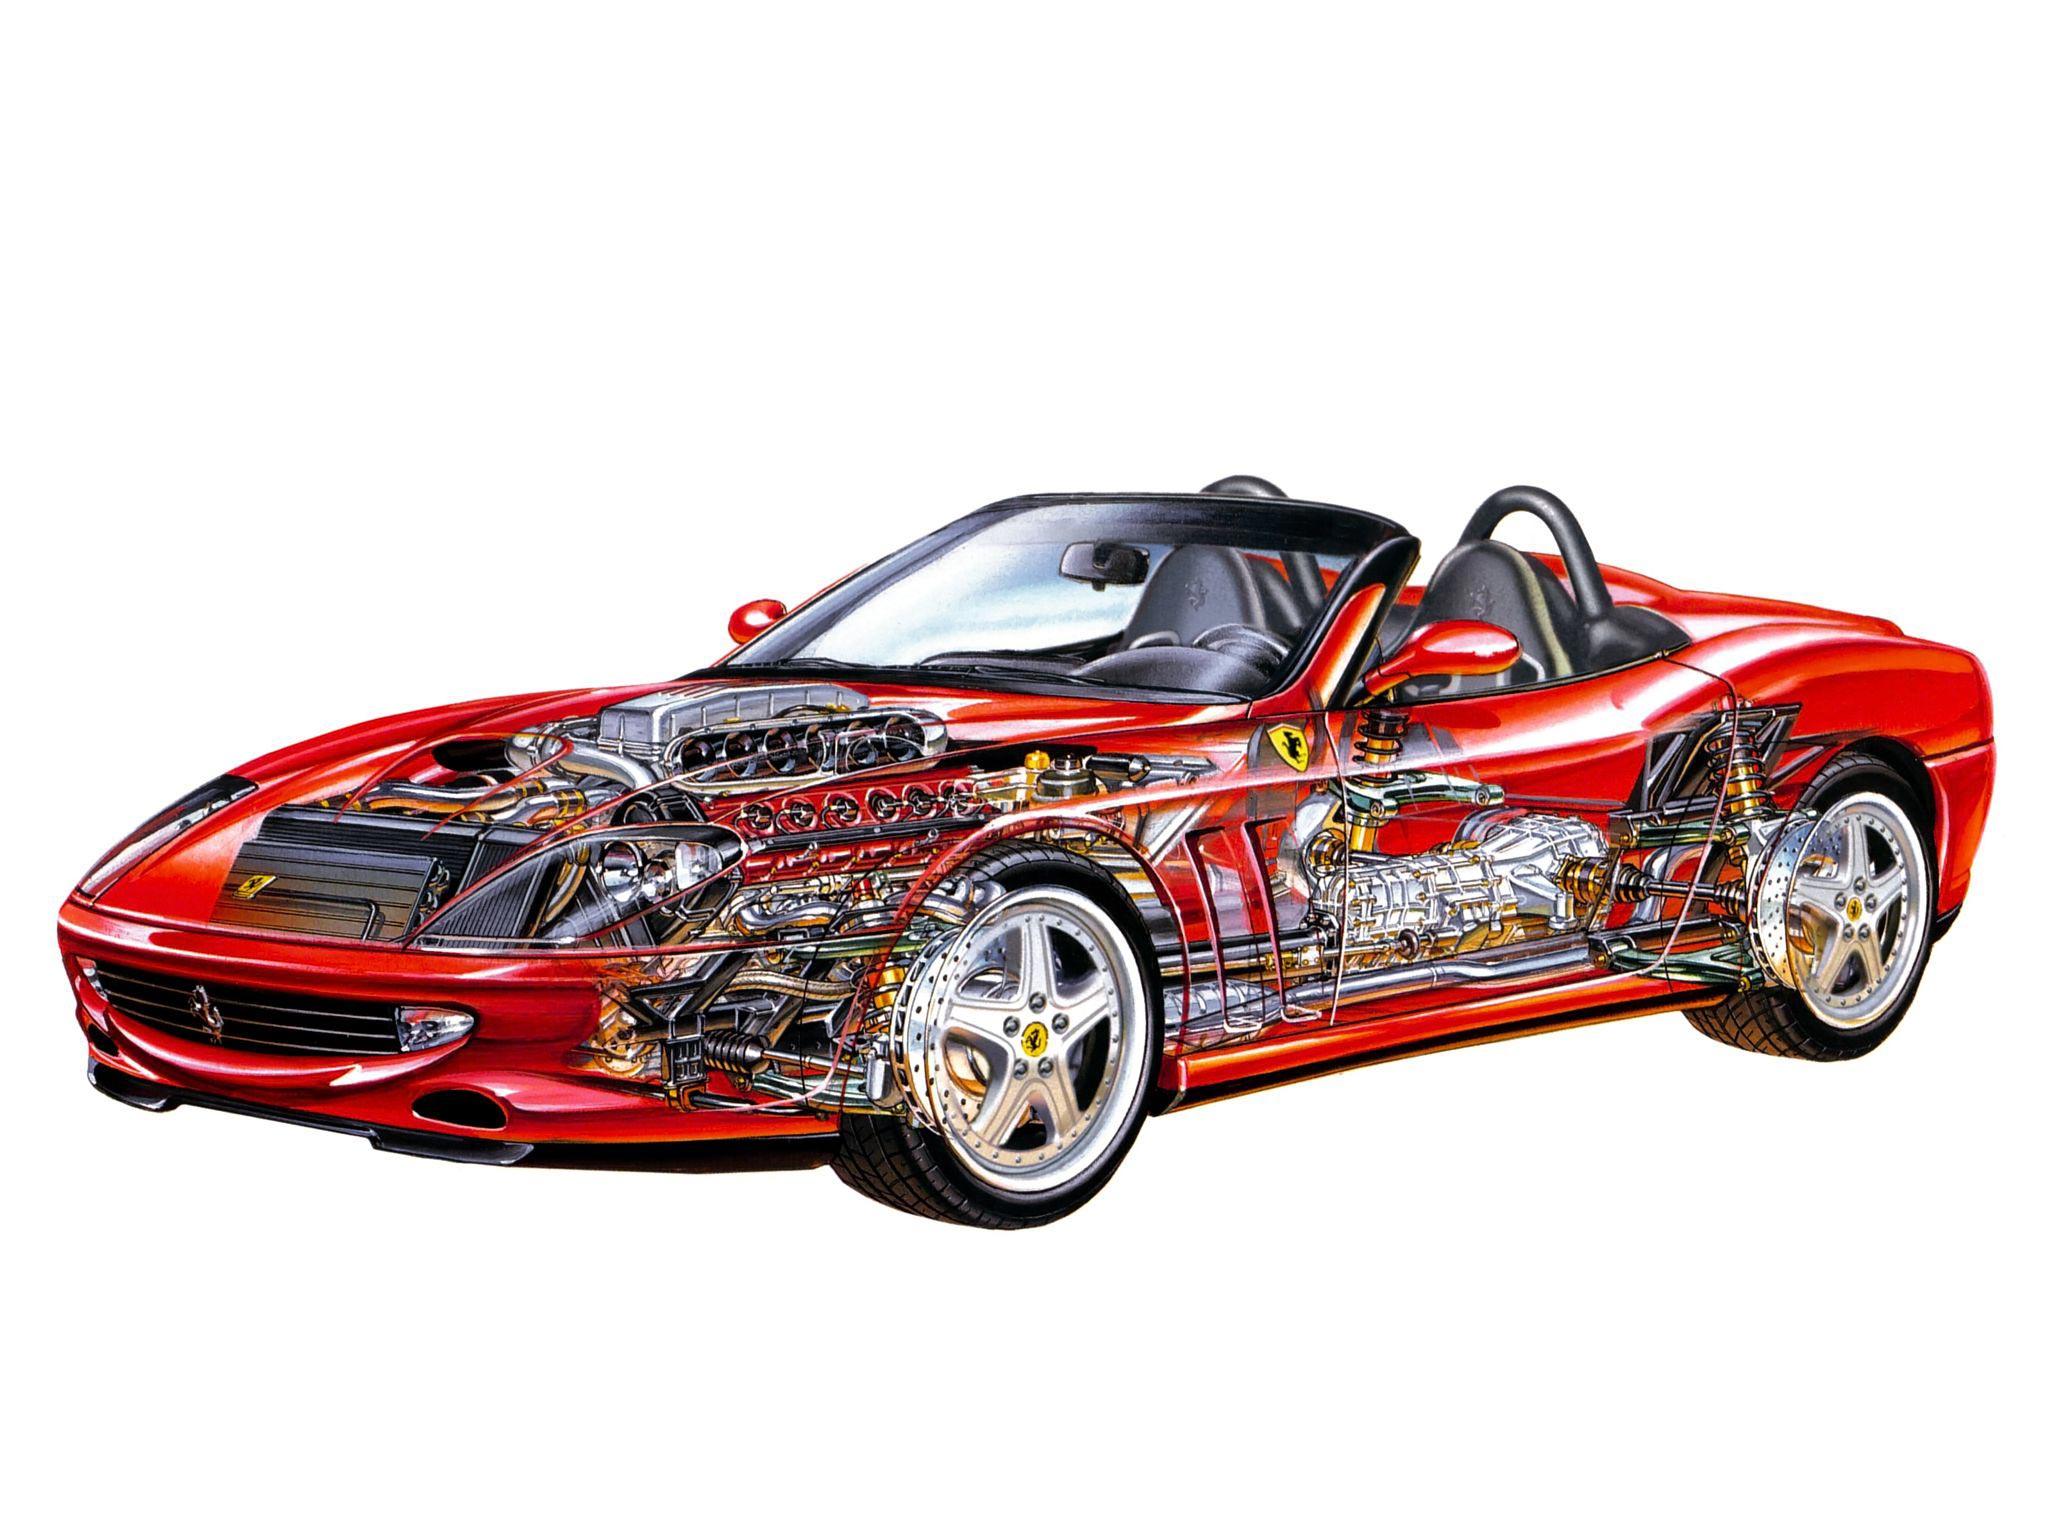 Ferrari 550 cutaway